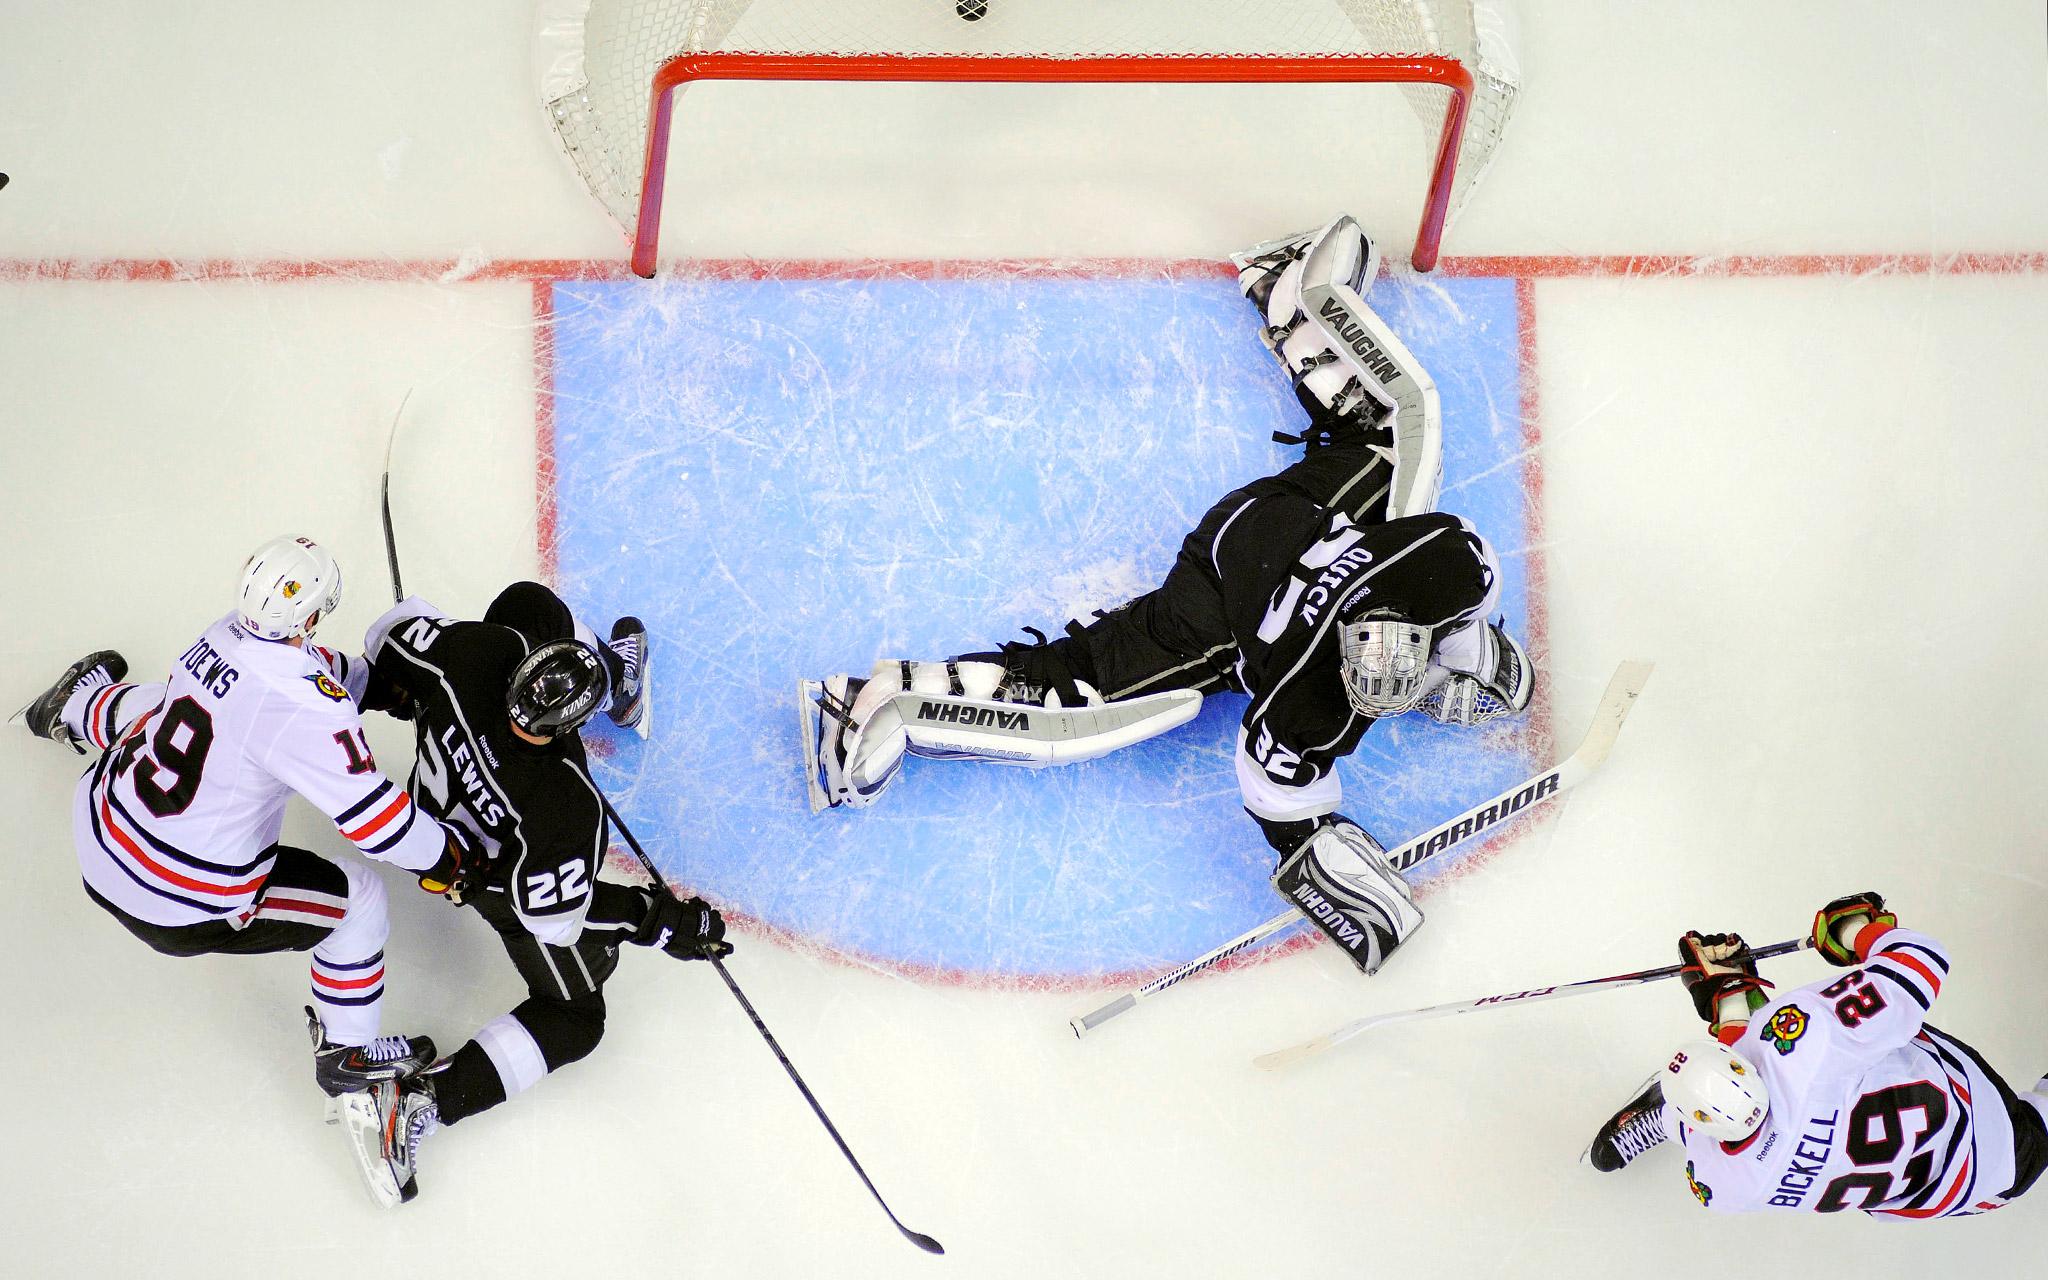 NHL PLAYOFFS LA KINGS